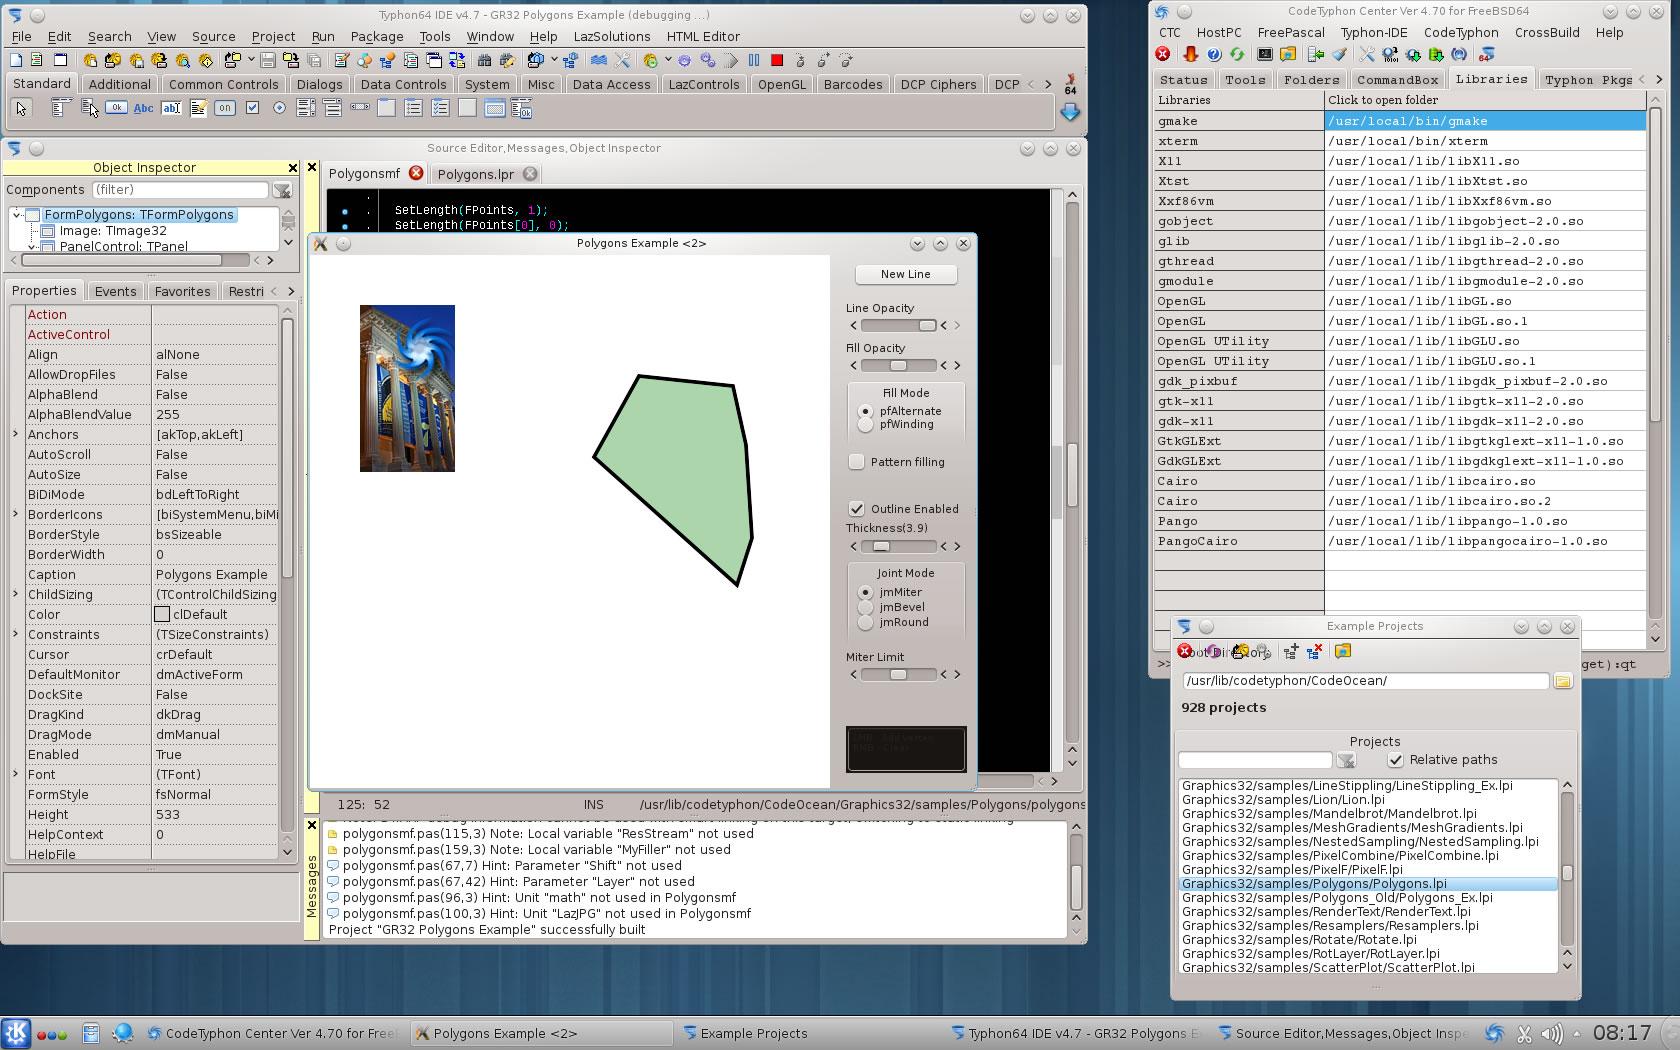 FreeBSD64-35.jpg